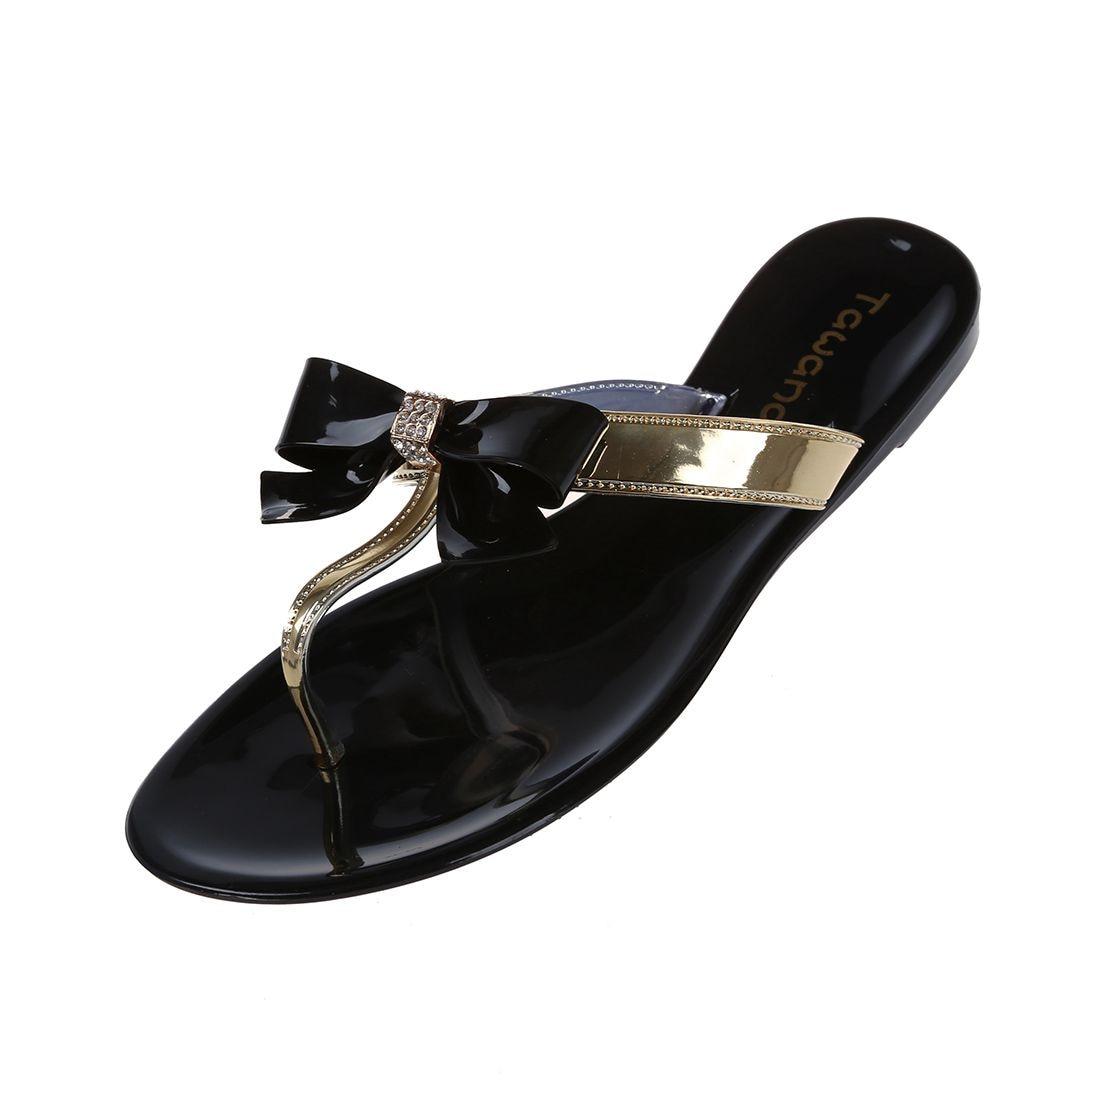 TAWANA Womens Ladies Toe Bow Diamante Jelly Summer Flat Flip Flop Thong Sandals